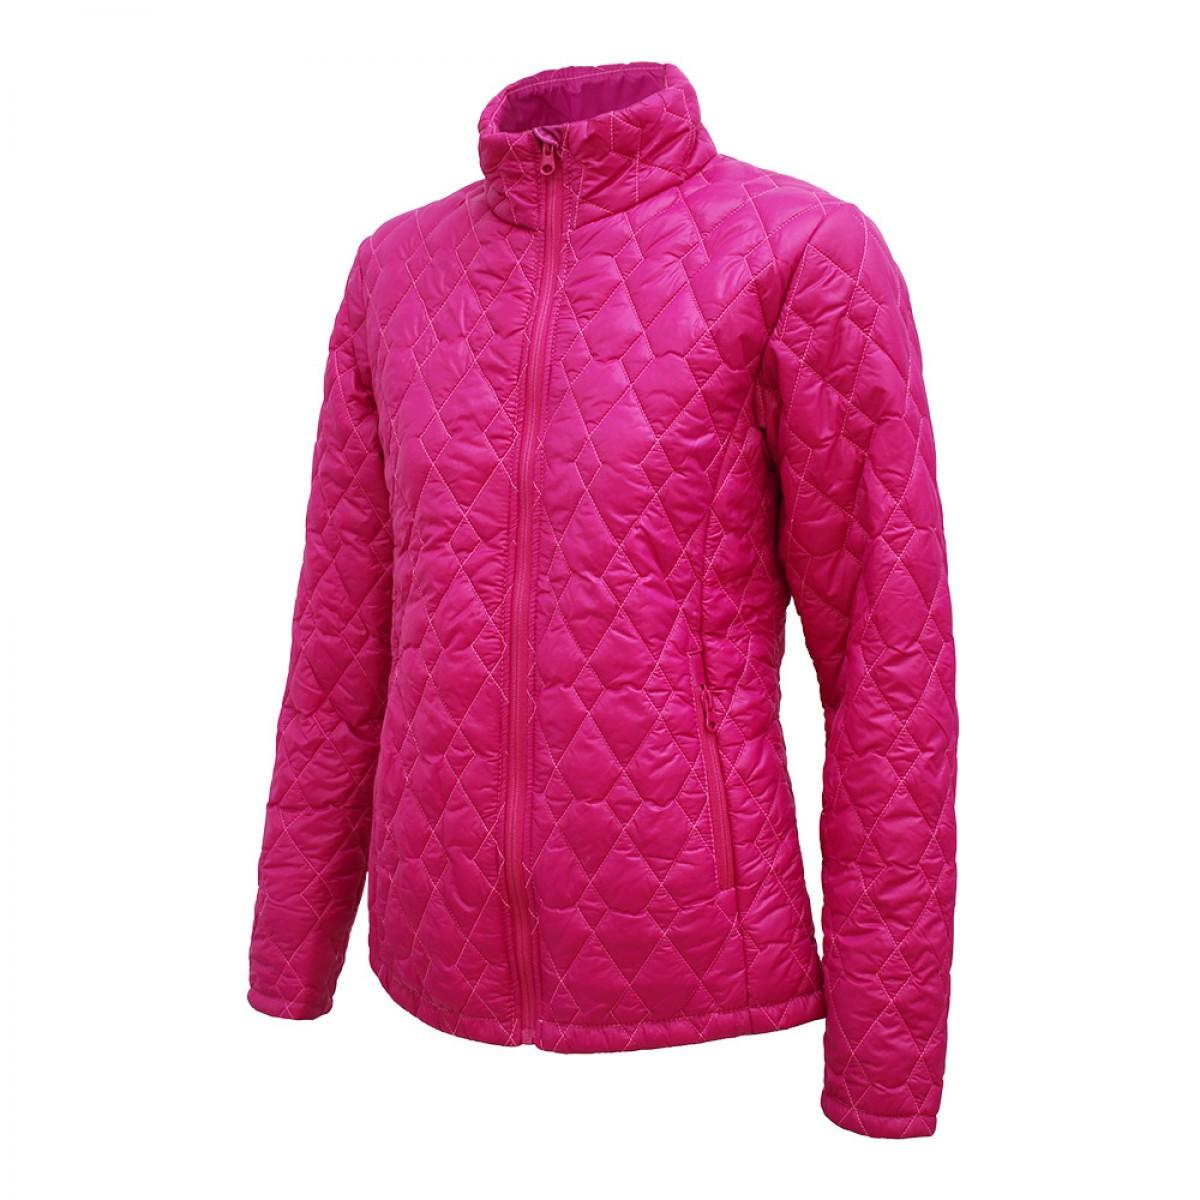 women-polyfiber-jacket-without-hoodiekpj06915-2a